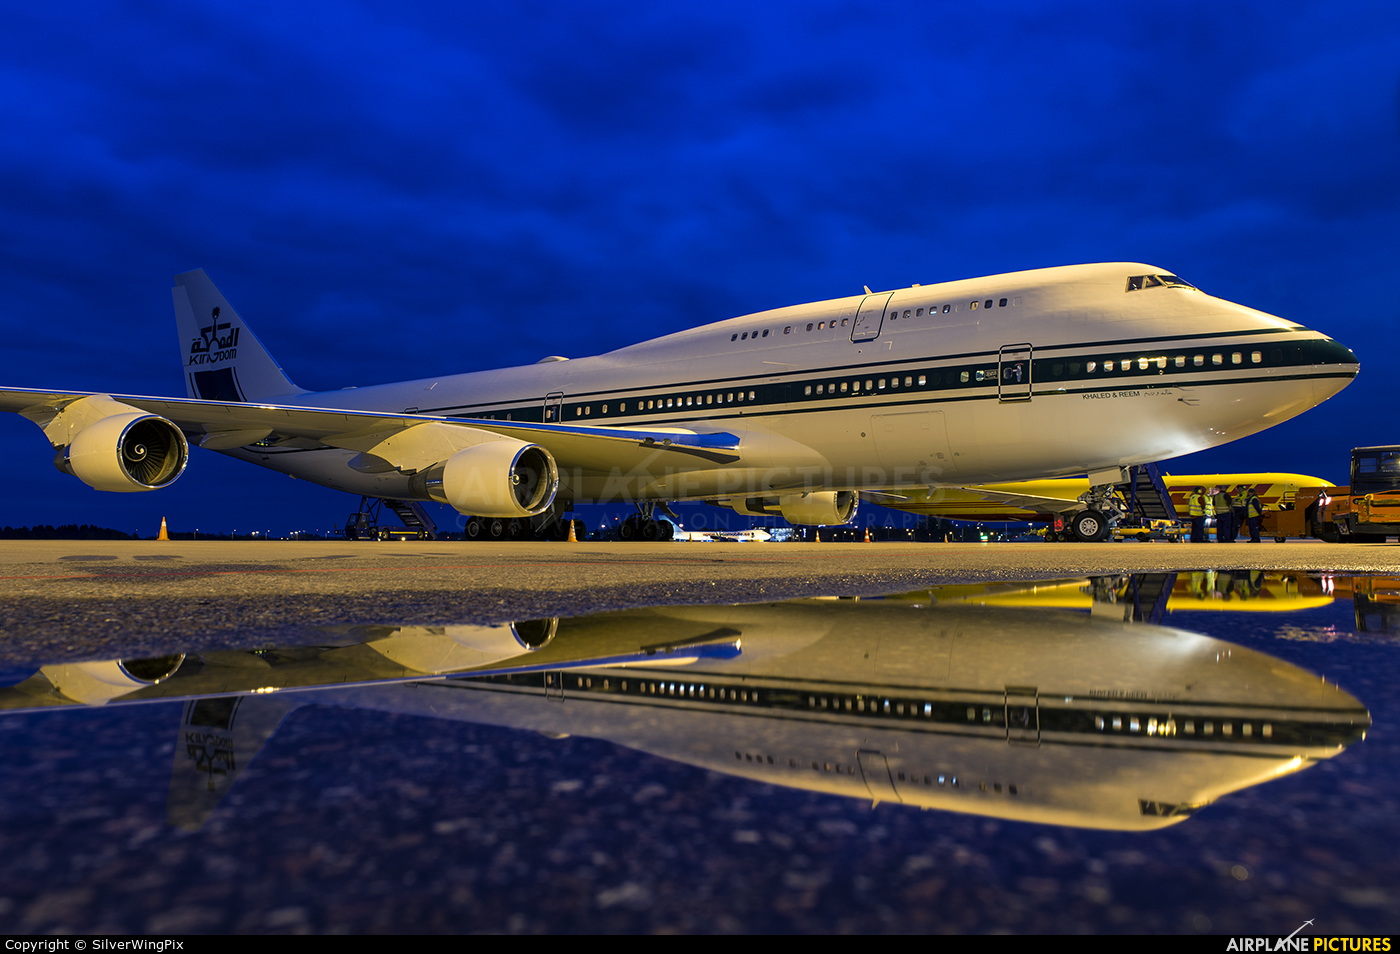 Kingdom Holding HZ-WBT7 aircraft at Stockholm - Arlanda